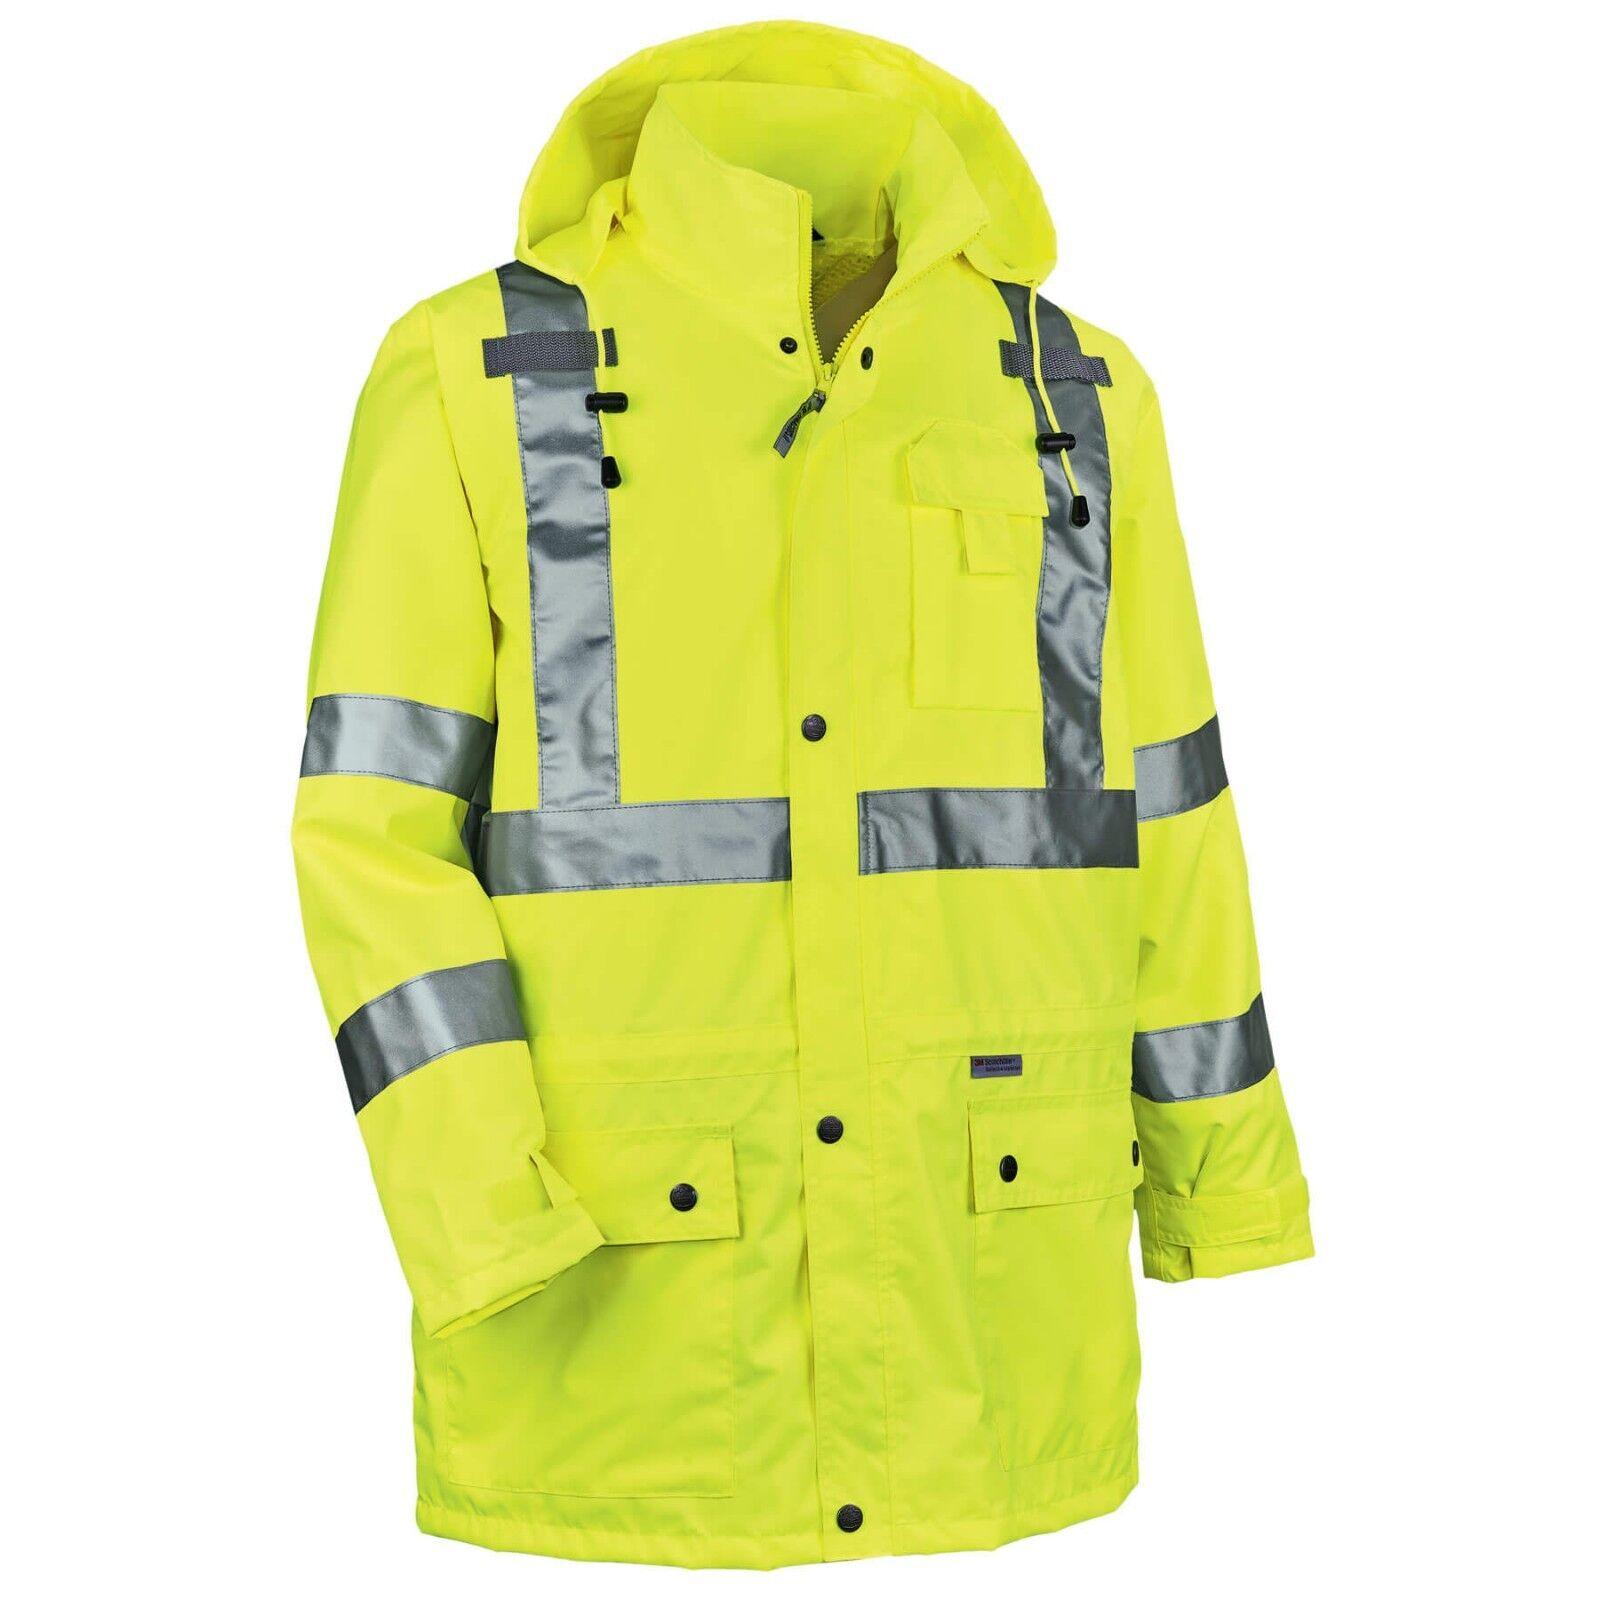 Details about Ergodyne GloWear Class 3 Reflective Safety Rain Jacket 6ba4c9cca41